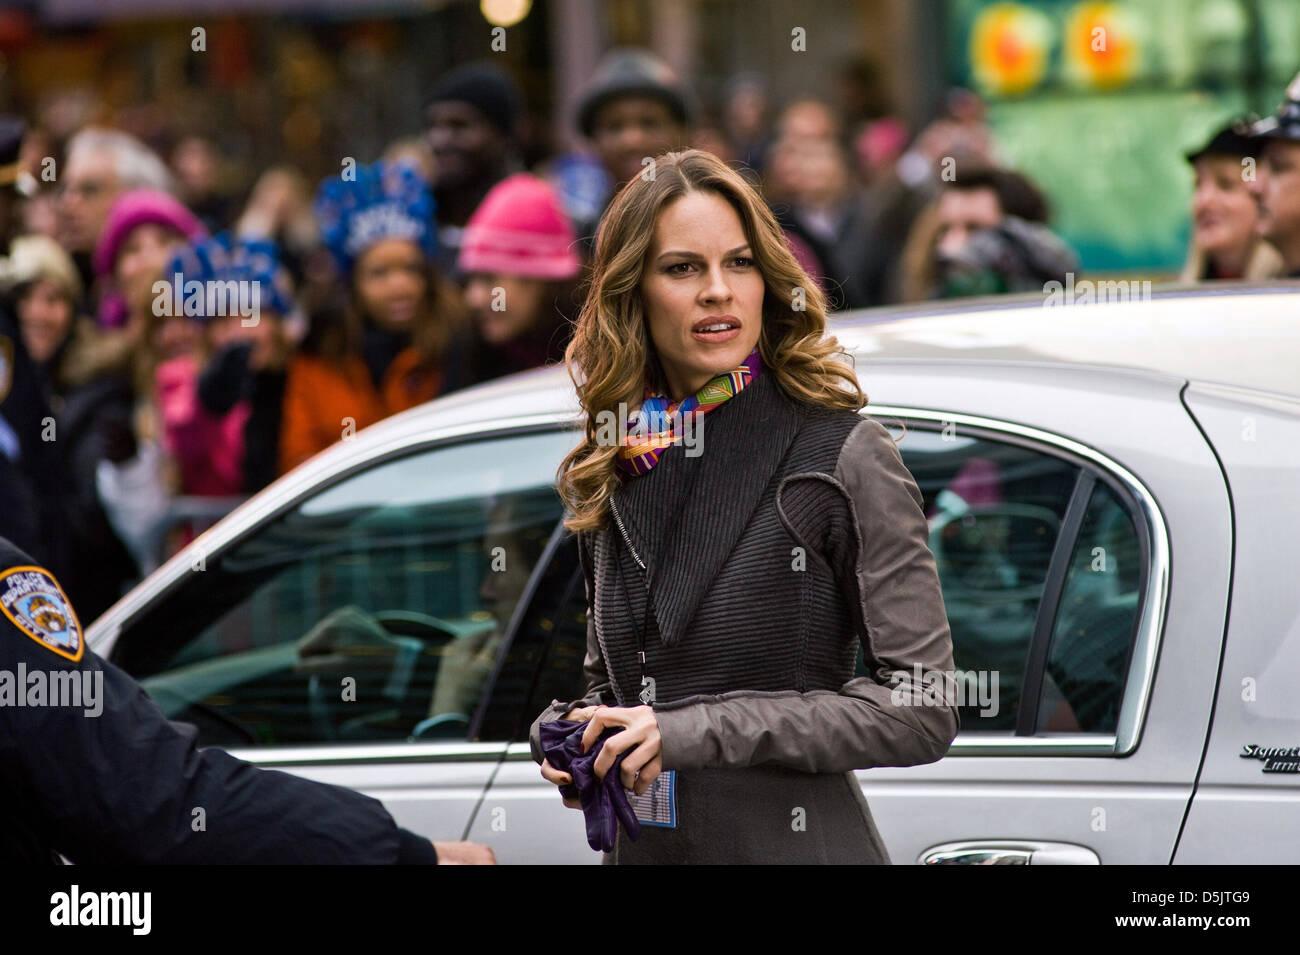 hilary swank new year s eve 2011 stock photo alamy https www alamy com stock photo hilary swank new years eve 2011 55118793 html